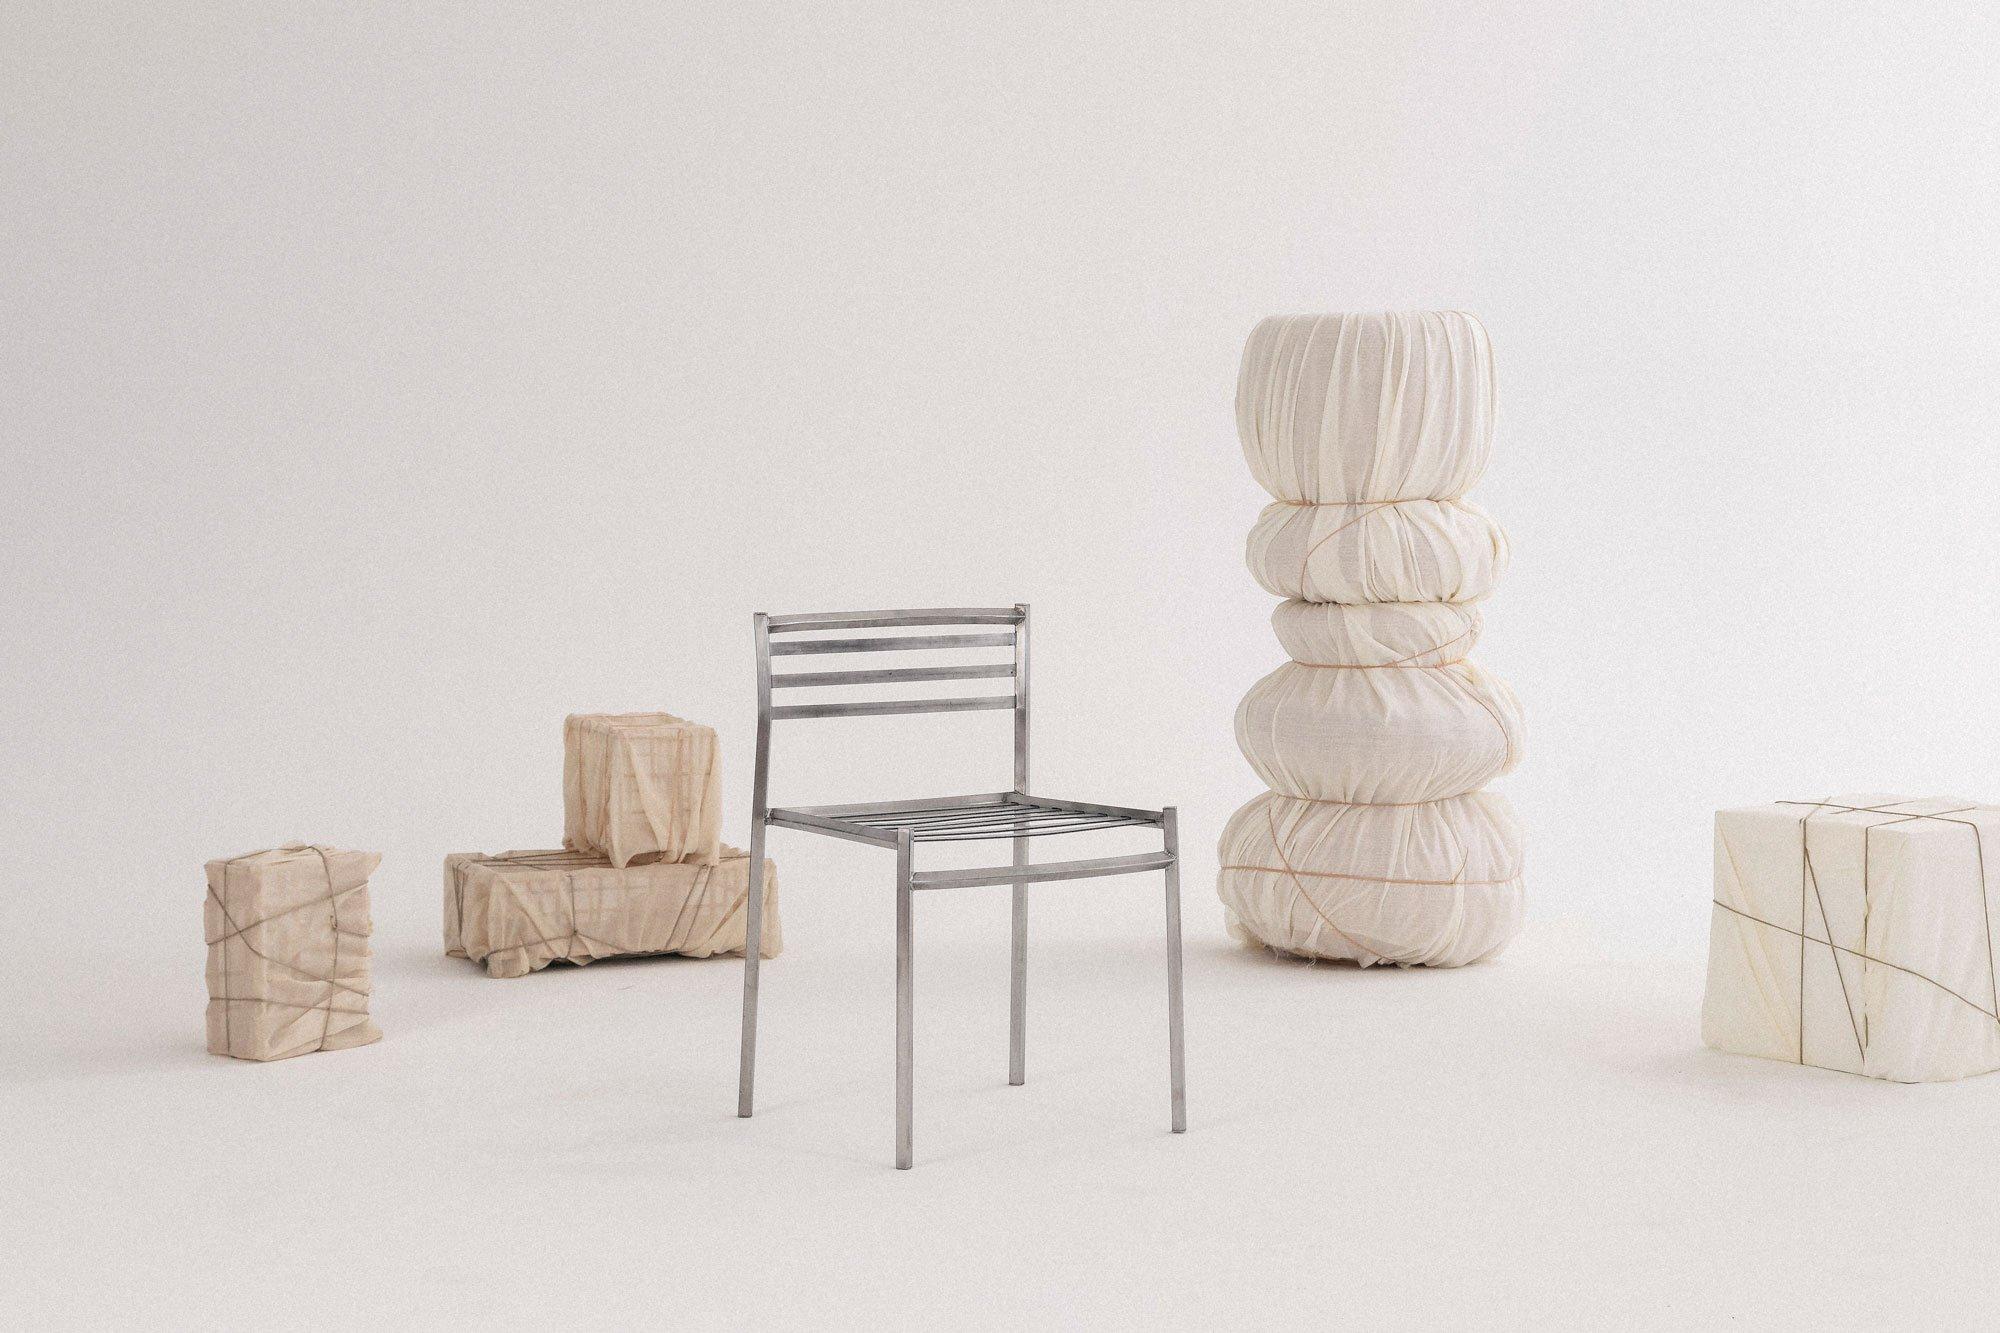 Ukurant Objects, 3daysofdesign 2020, jeunes designers, Therese Hald Boesen